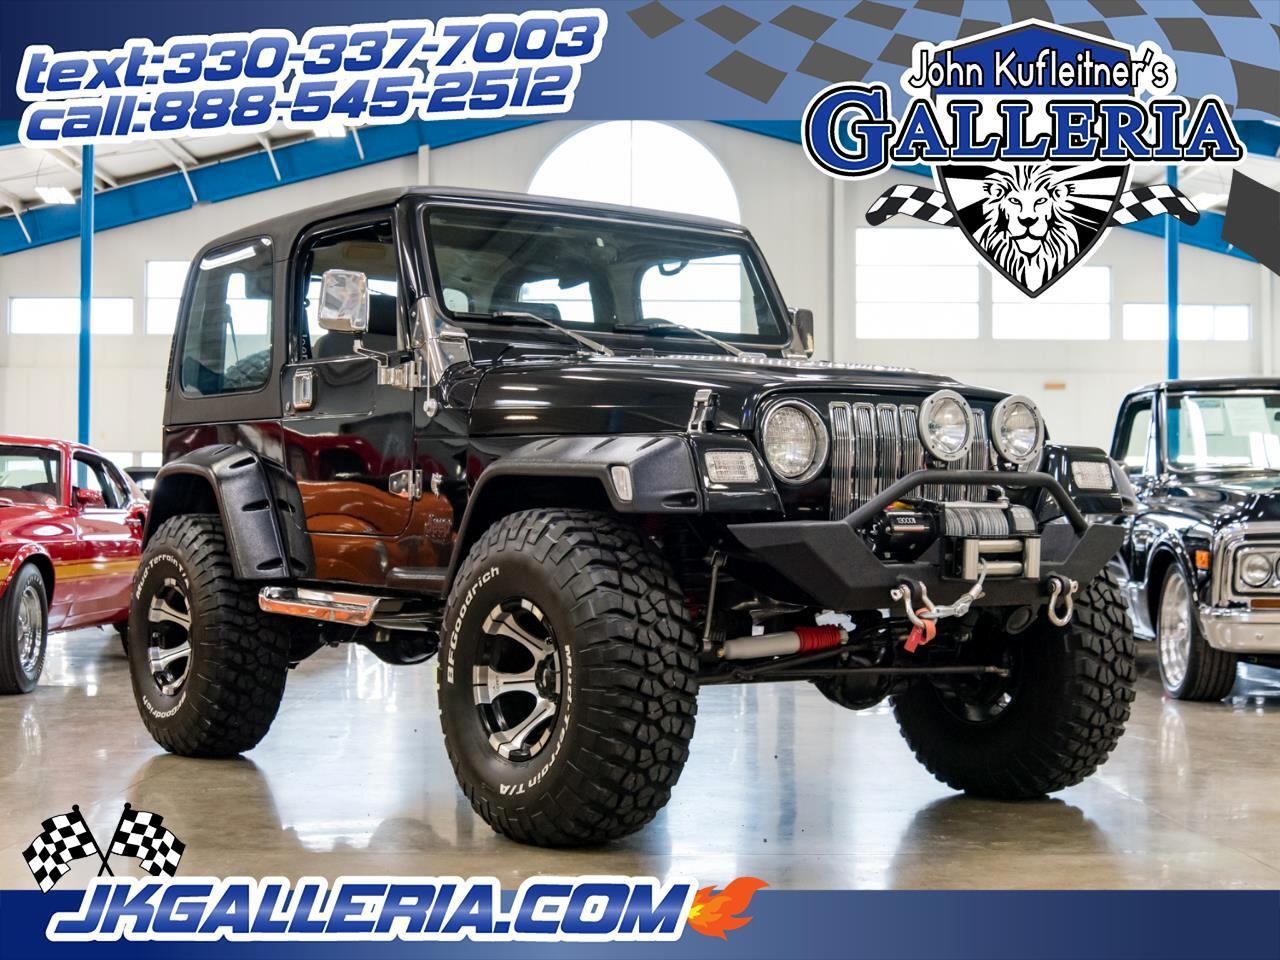 1998 Jeep Wrangler 2dr SE